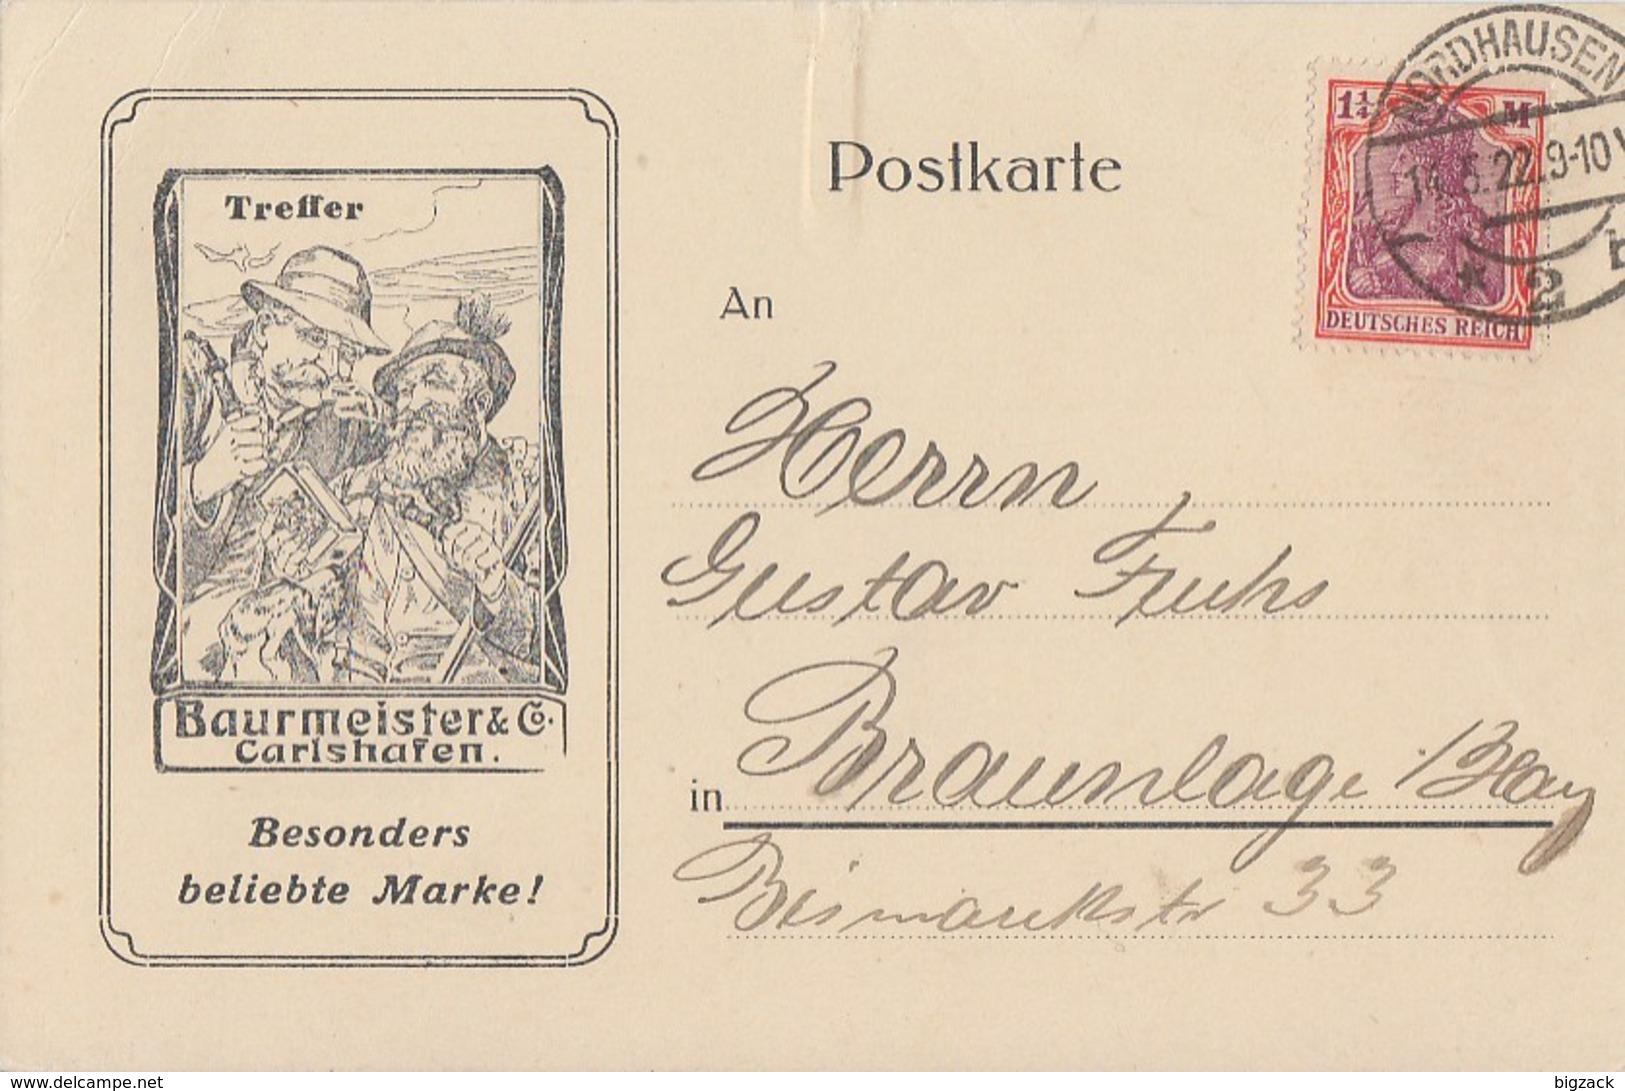 DR Werbekarte Baurmeister & Co EF Minr.198 Nordhausen 14.5.22 - Briefe U. Dokumente